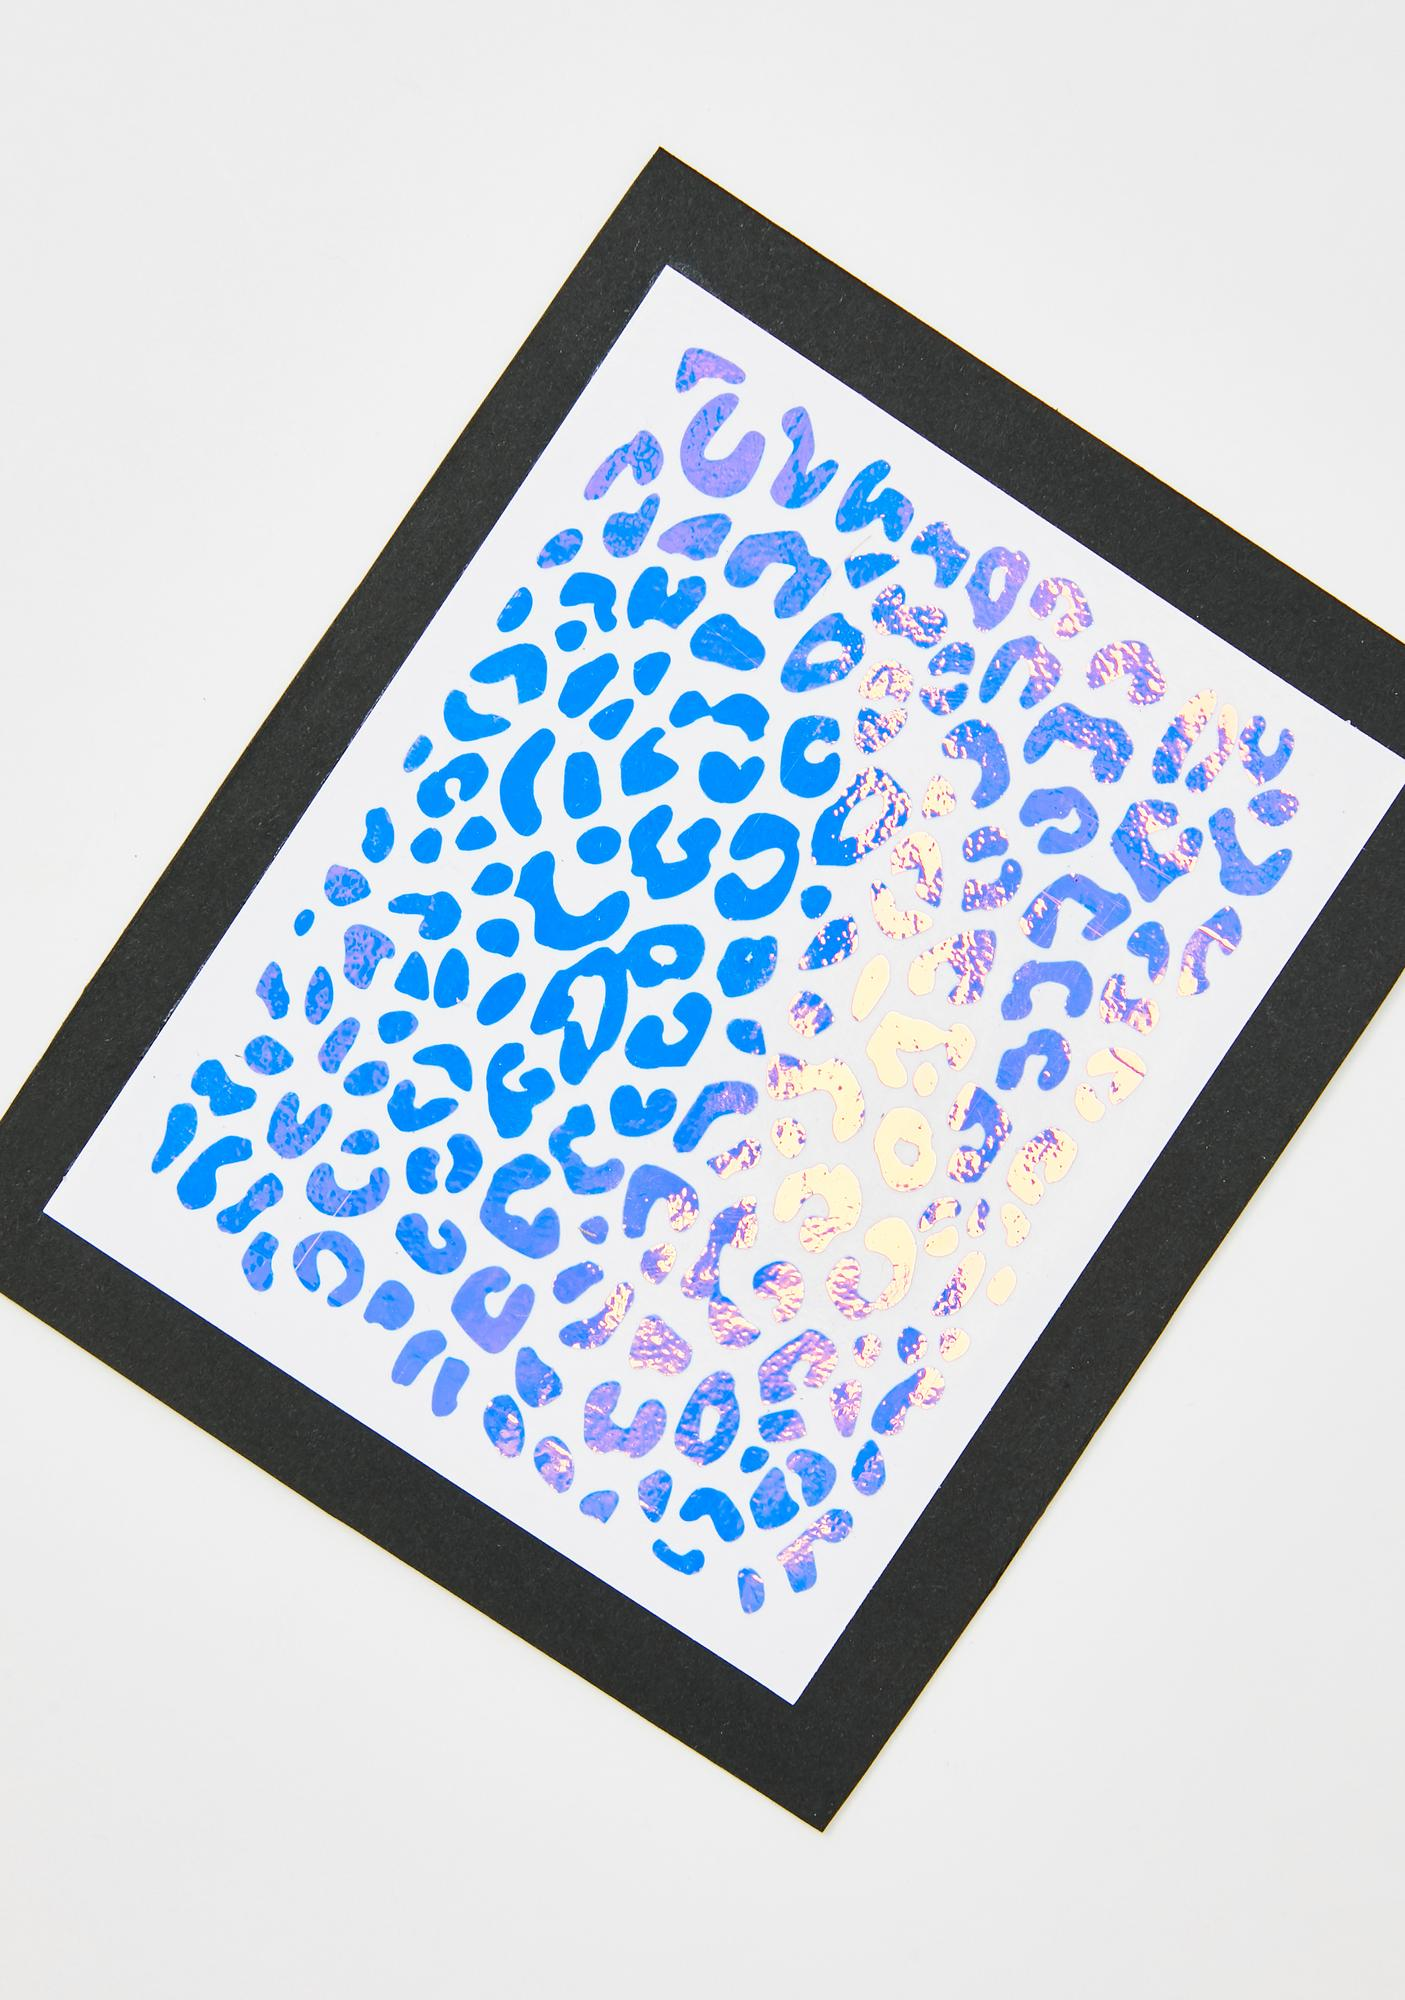 Stinnys Cheetah Print Body N' Face Stickers